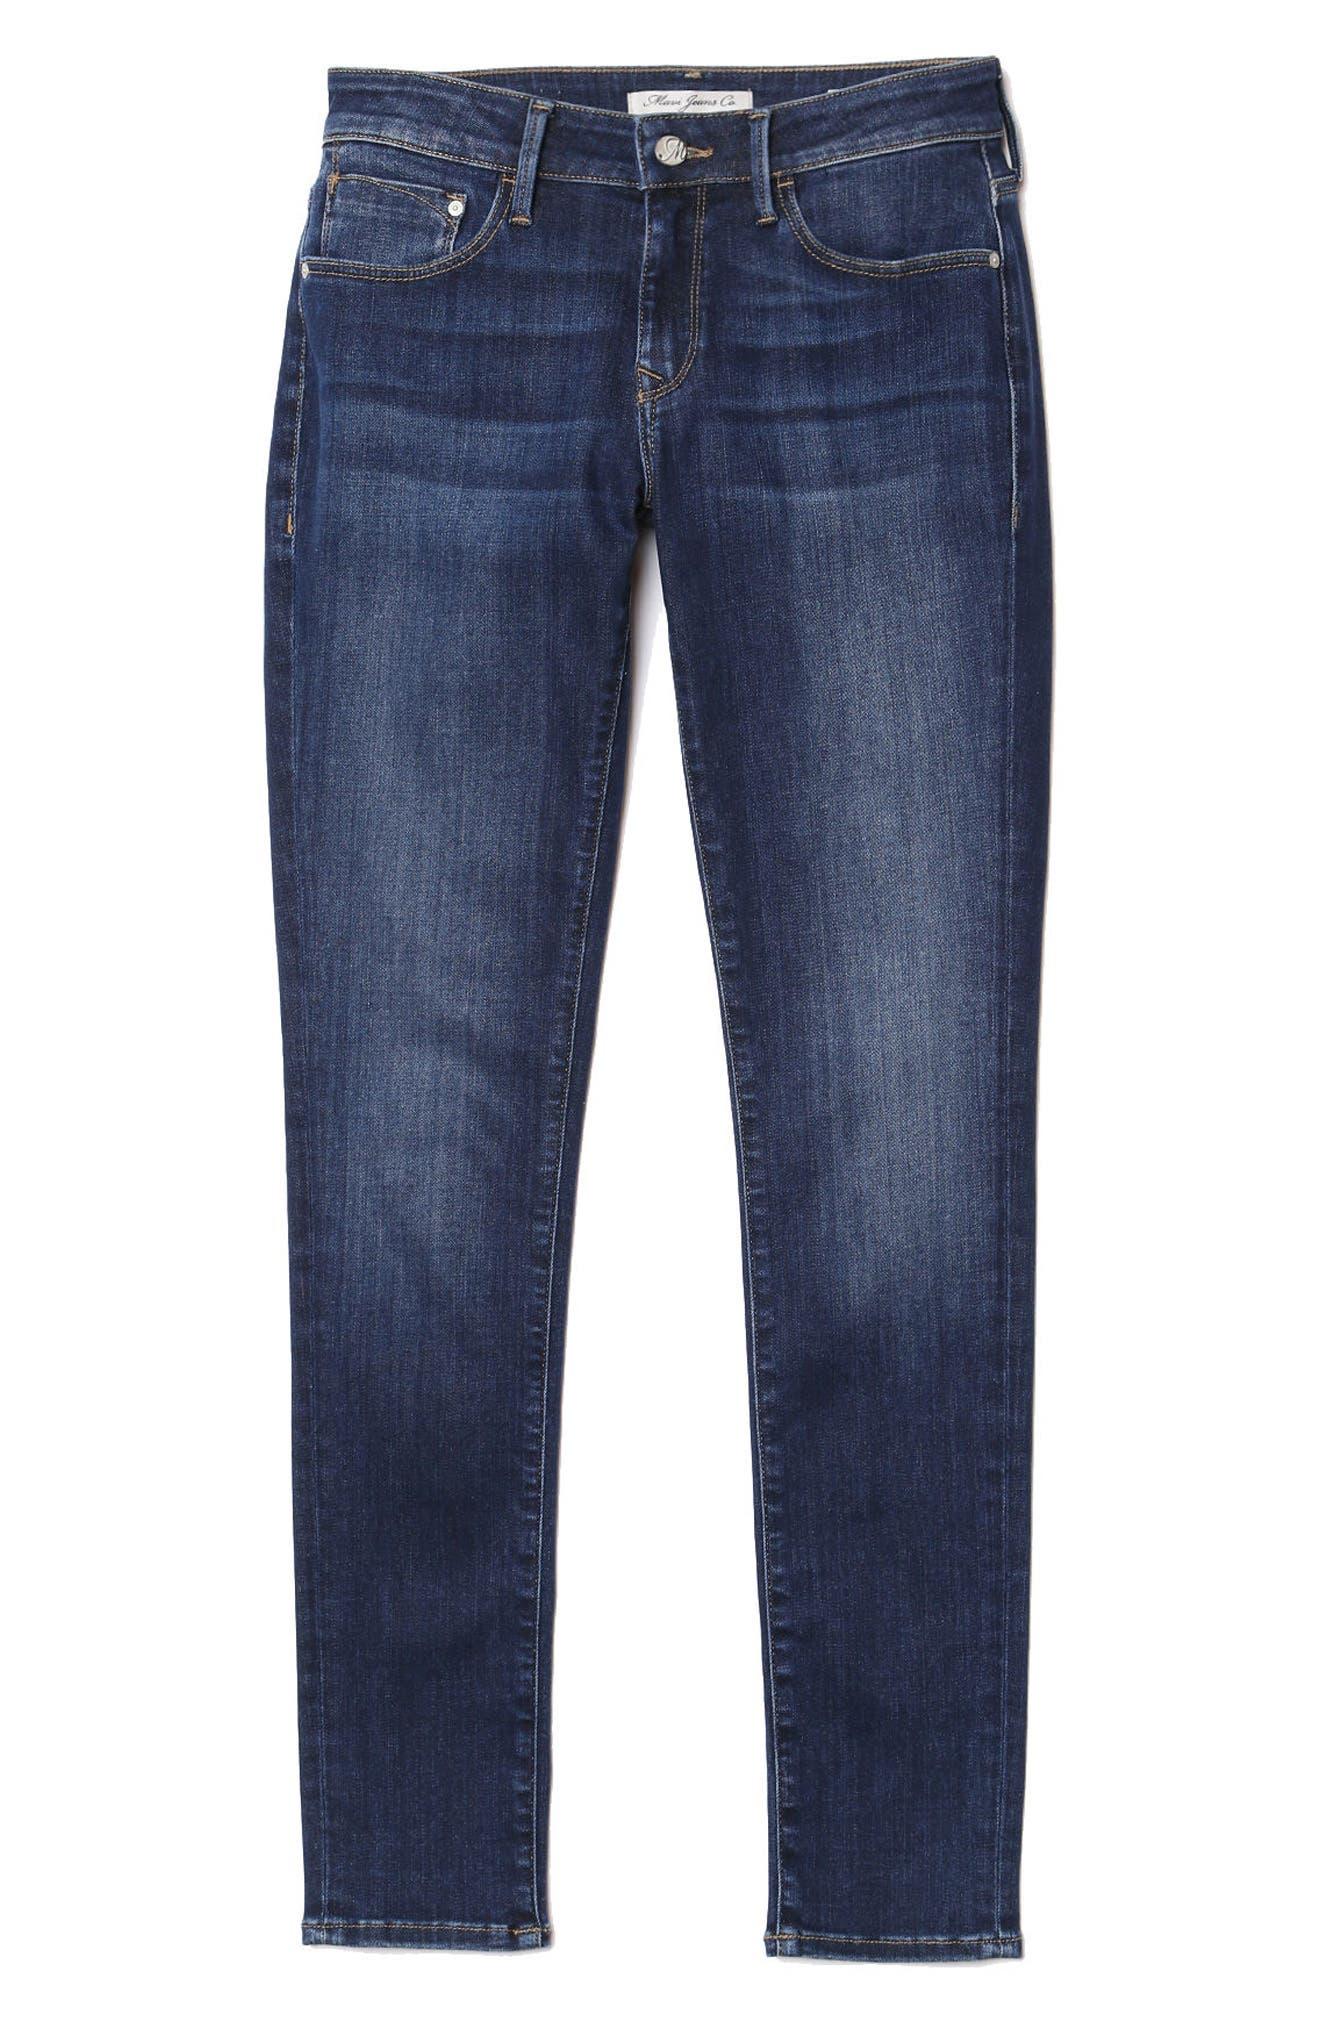 Alexa Supersoft Skinny Jeans,                             Alternate thumbnail 4, color,                             DARK SUPER SOFT